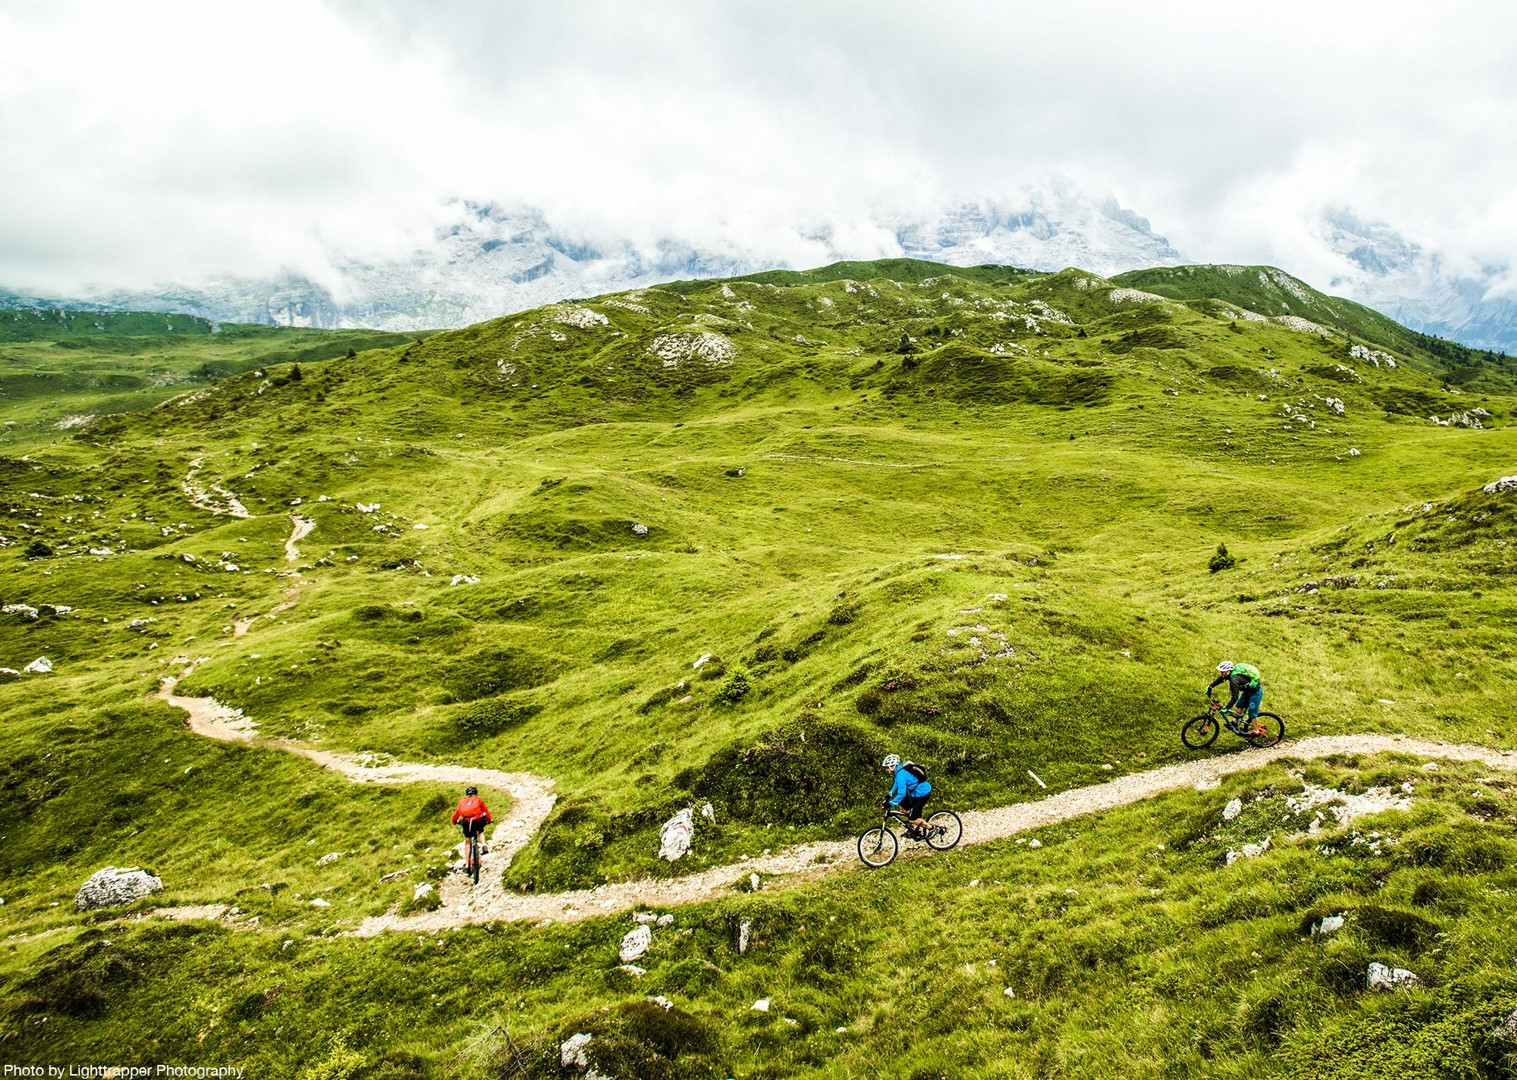 saddle_skedaddle_italy_2017_day6_brenta_dolomites_176-2.jpg - Italy - Dolomites of Brenta - Guided Mountain Bike Holiday - Mountain Biking